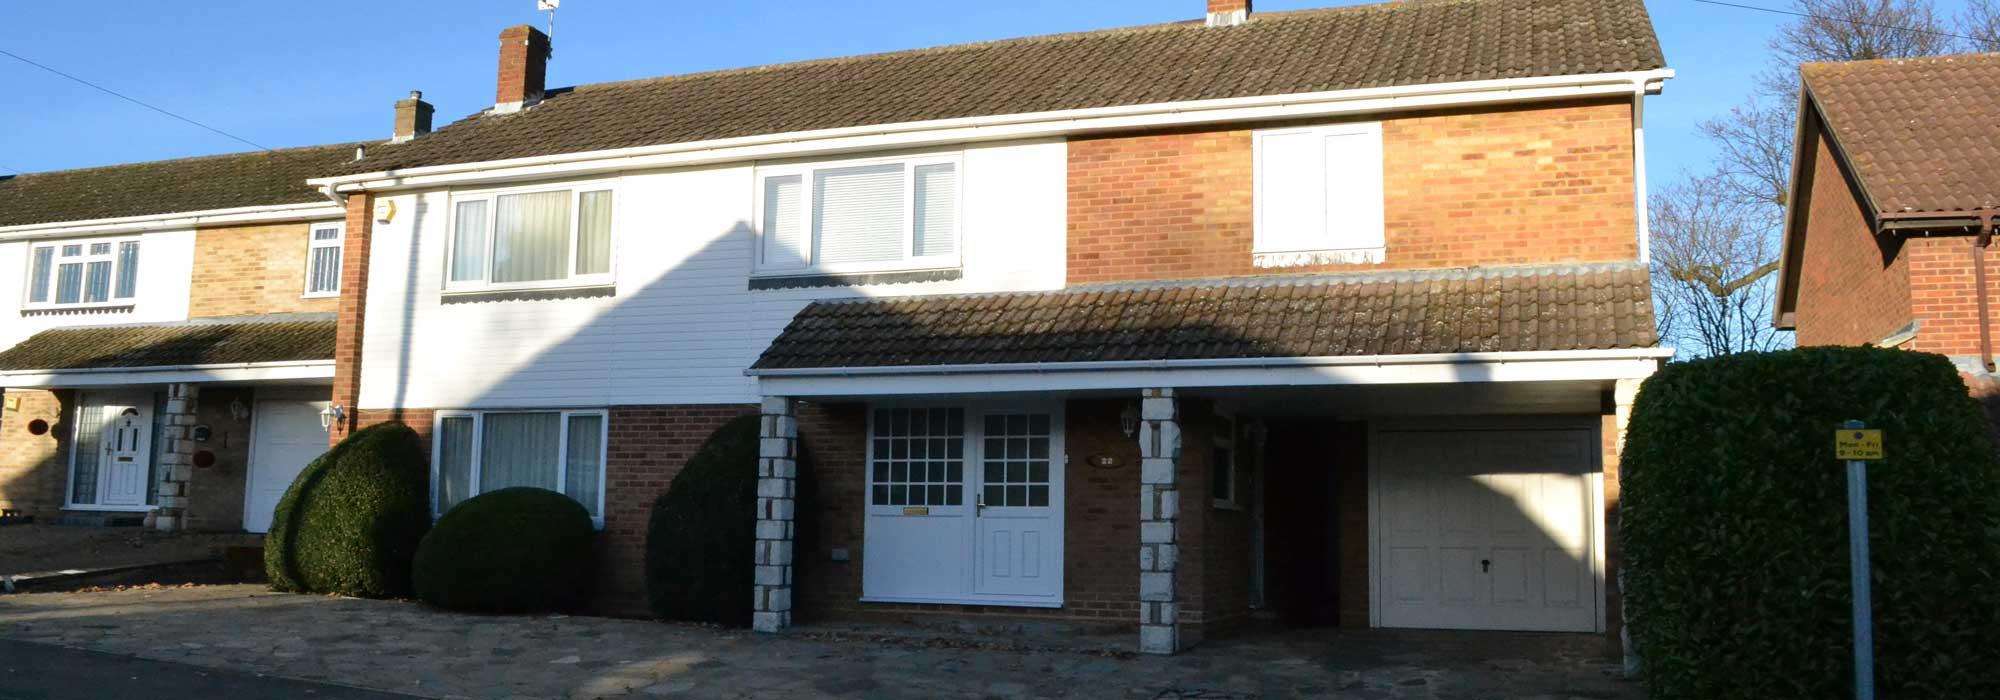 Bassingbourne Close, Broxbourne, EN10 7PW